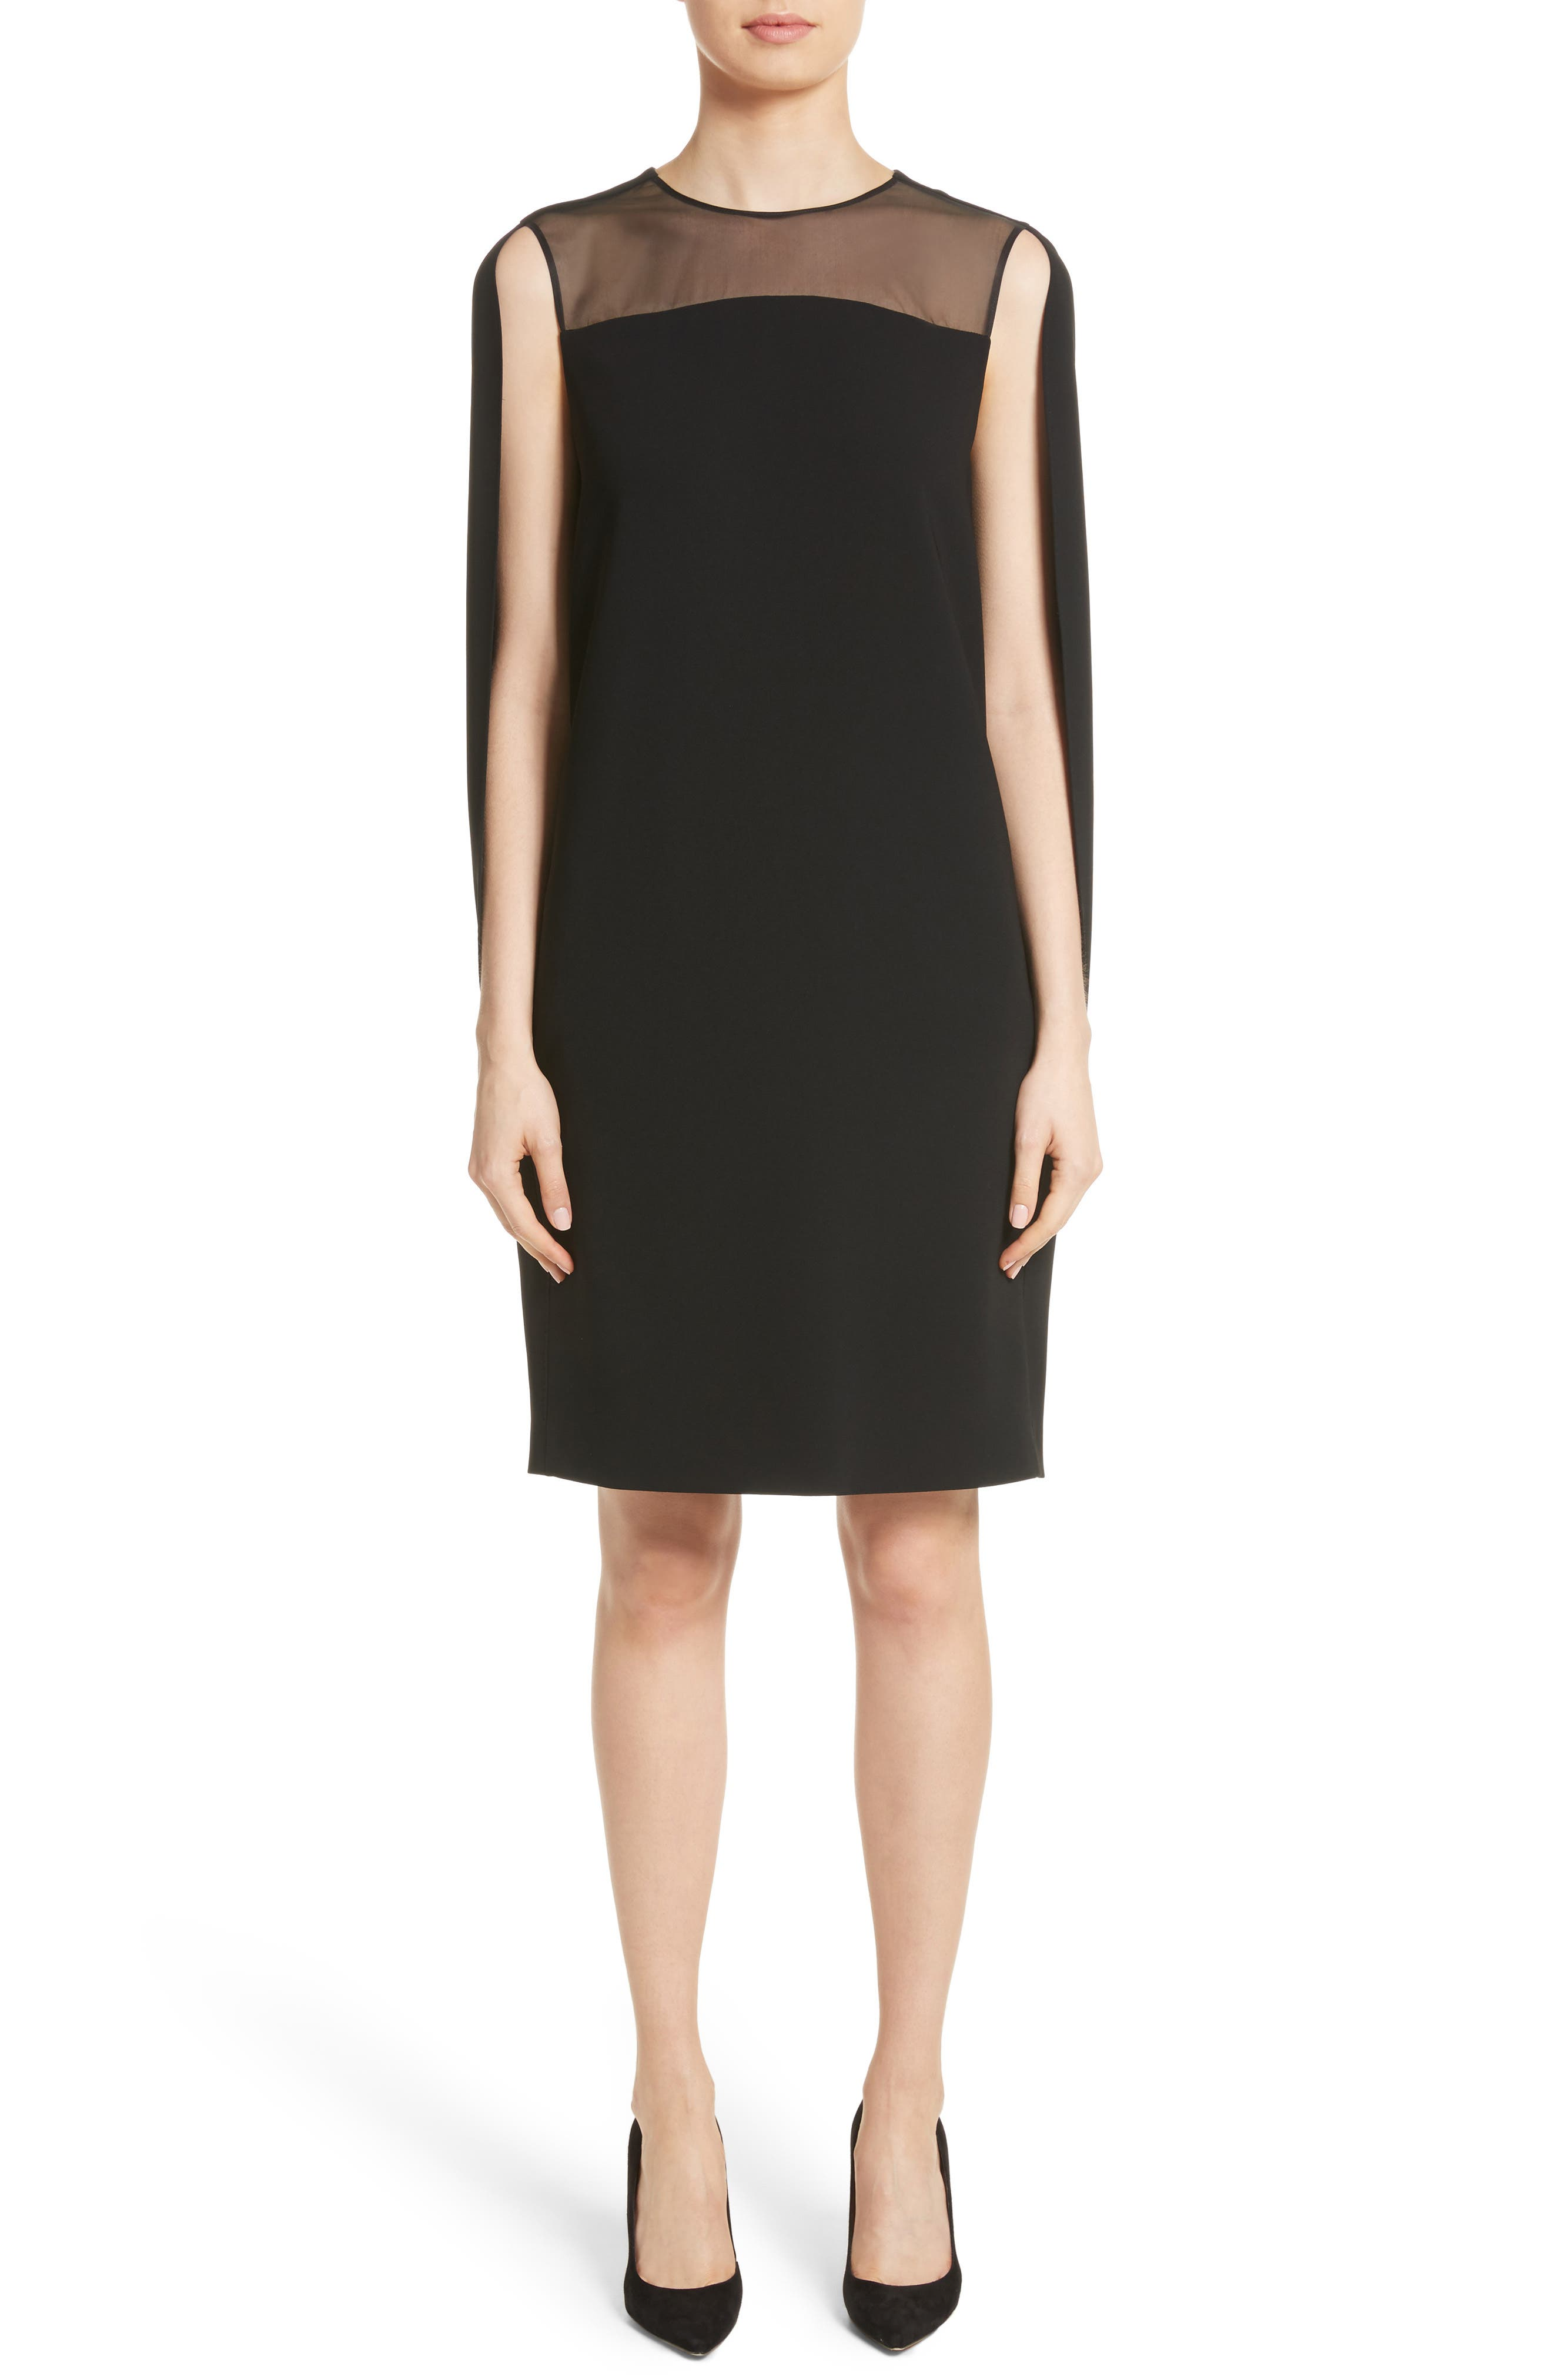 Sospiro Cape Shift Dress,                             Main thumbnail 1, color,                             Black